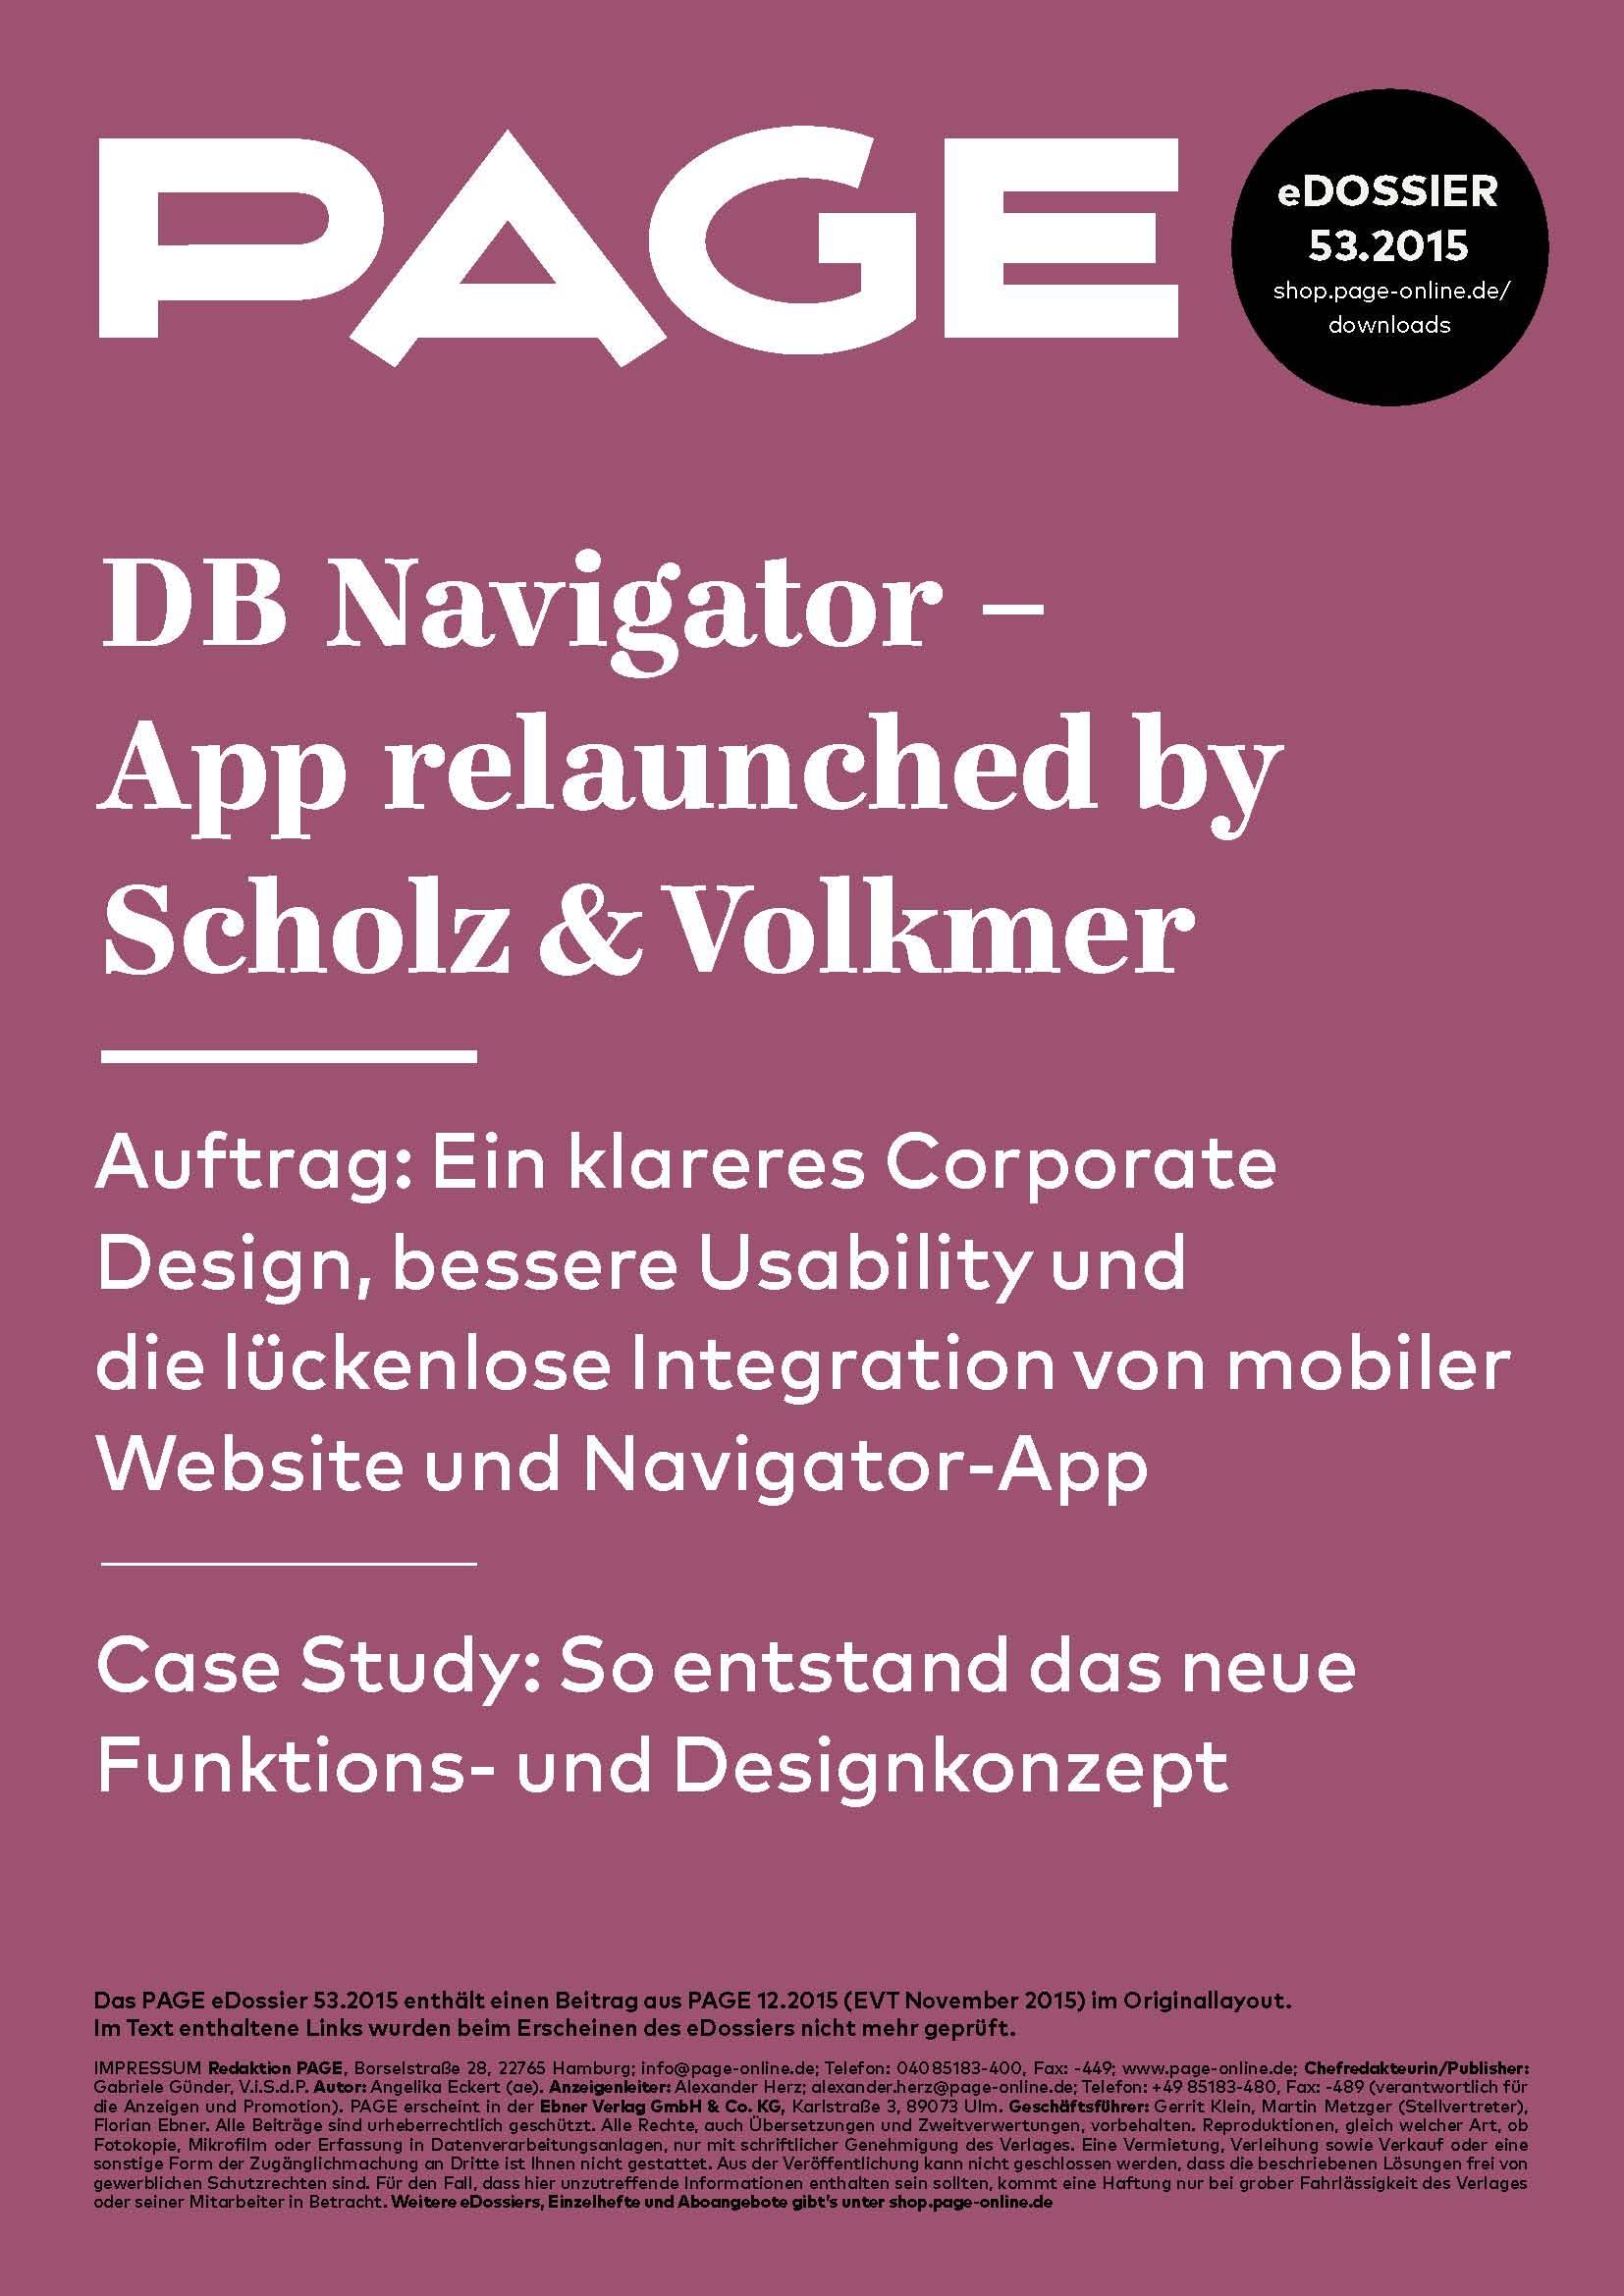 Produkt: eDossier »DB Navigator – App relaunched by Scholz & Volkmer«